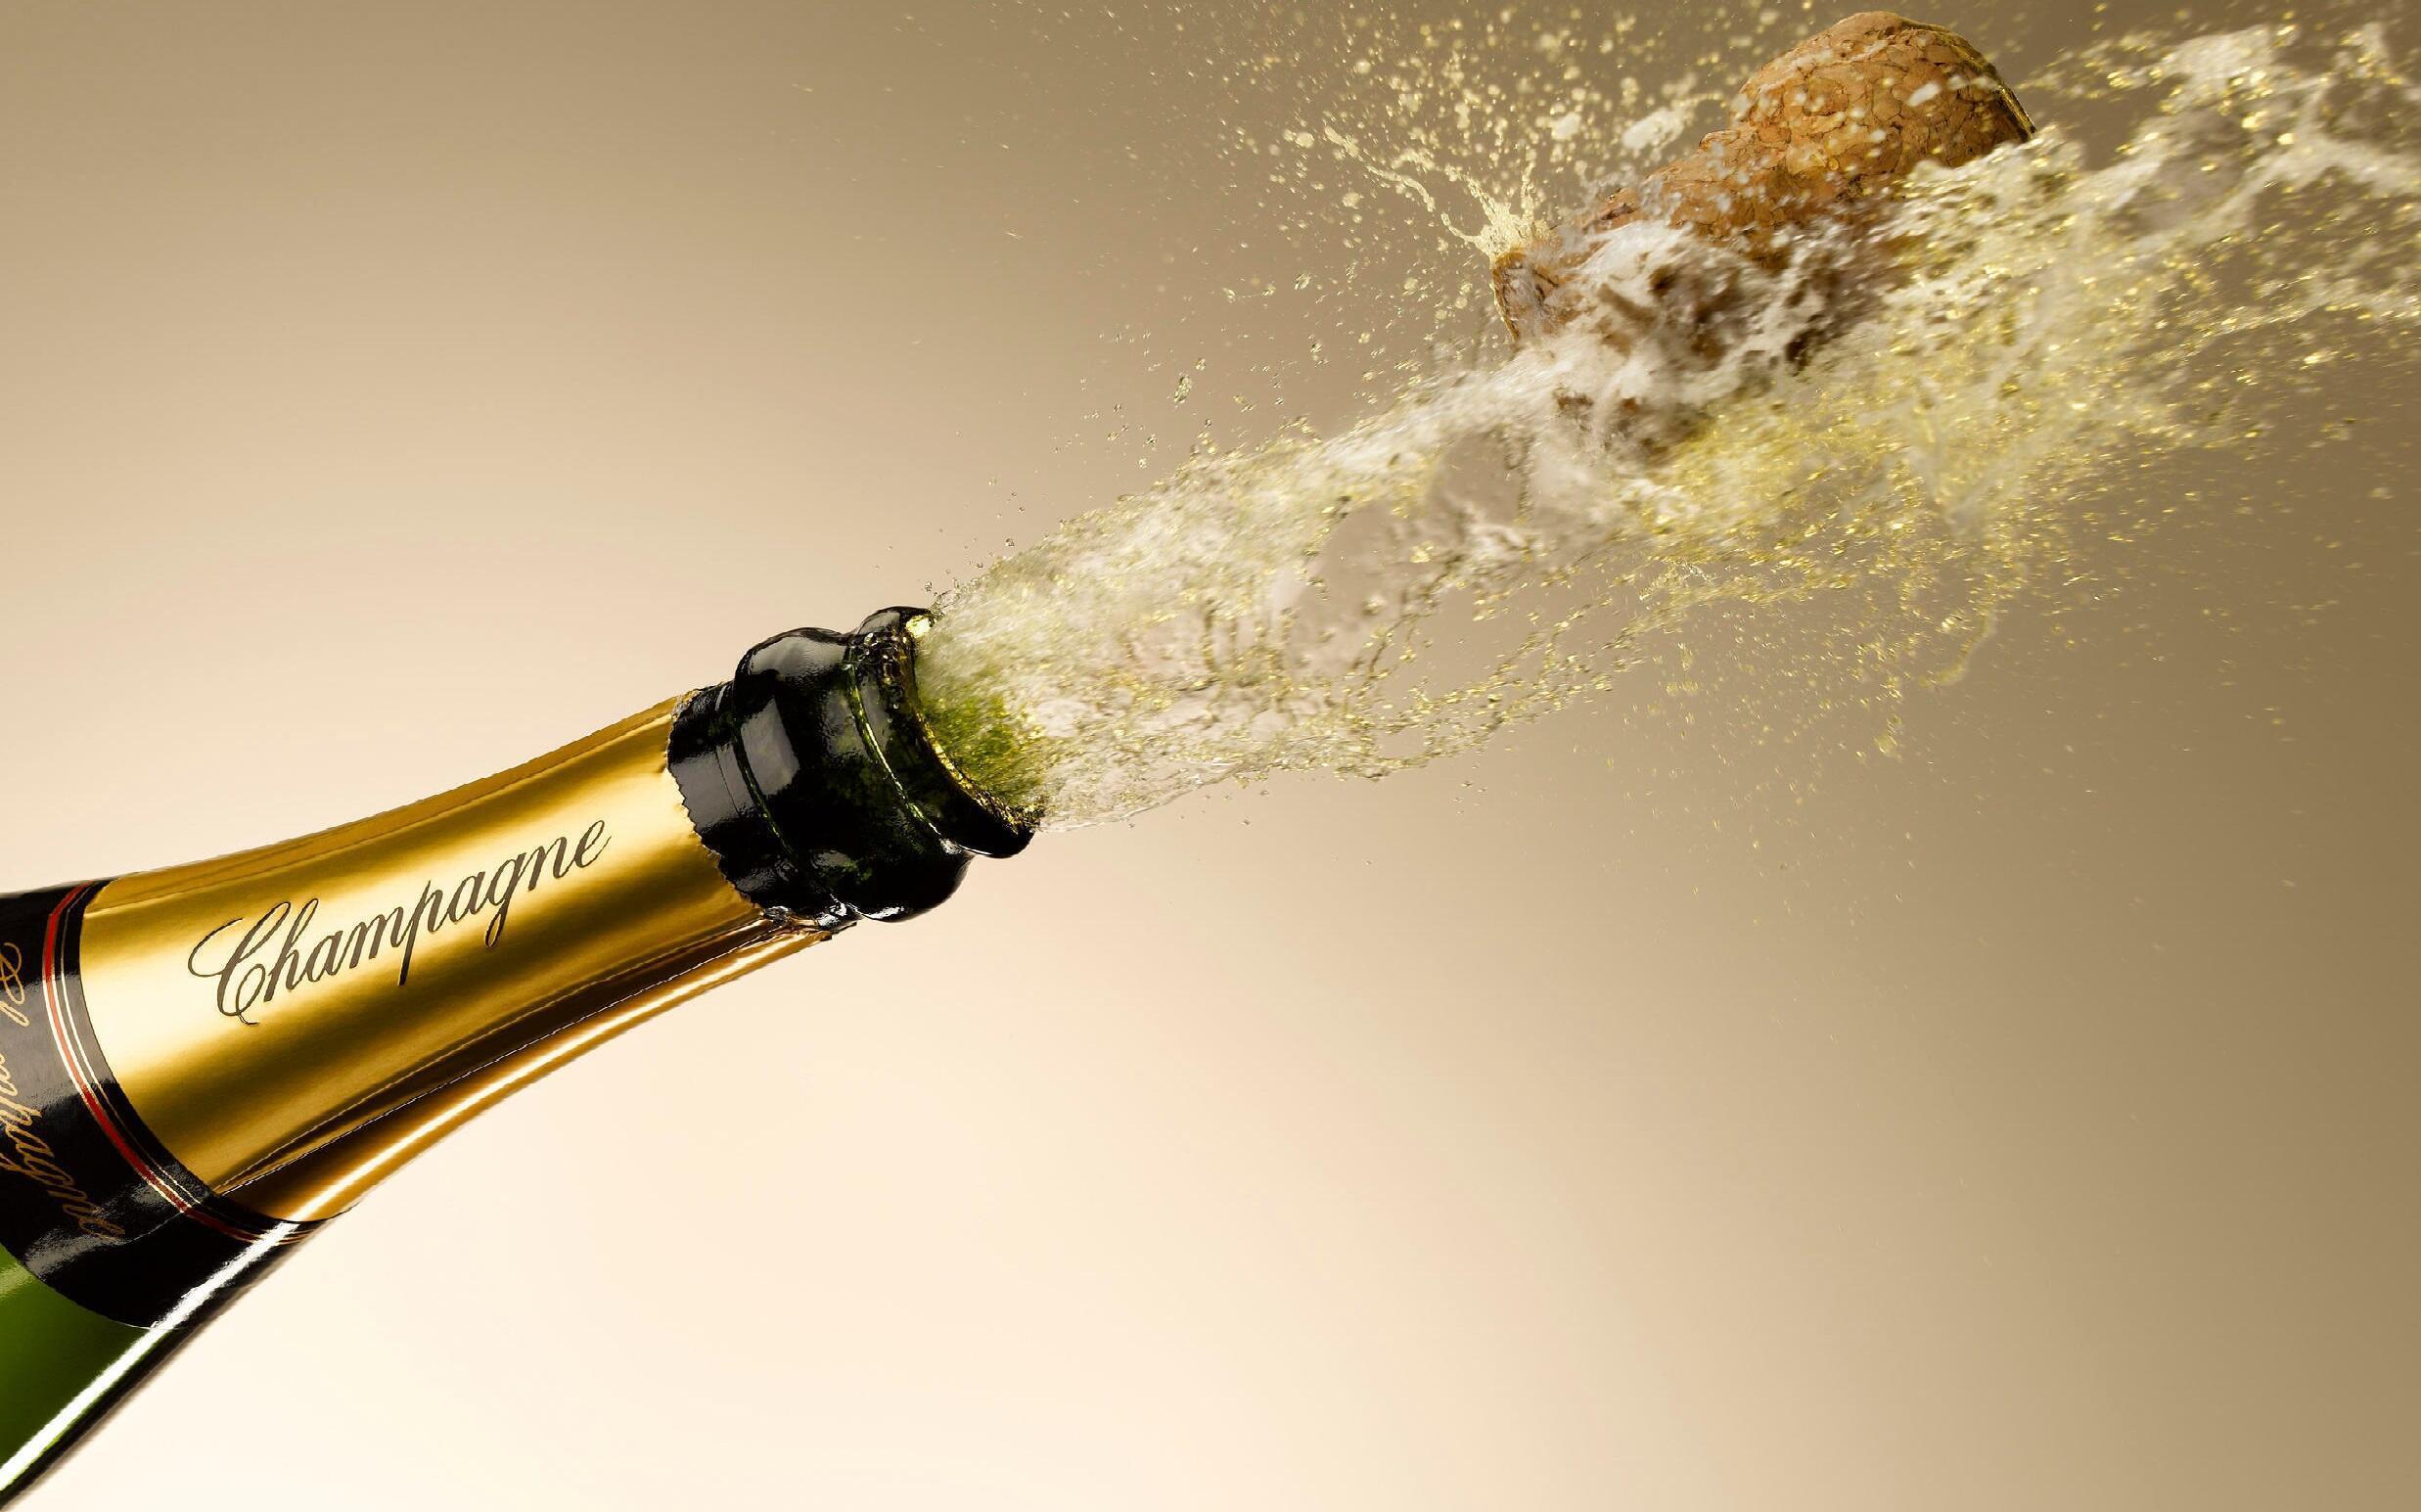 2019-12-04 champagne cork alcohol